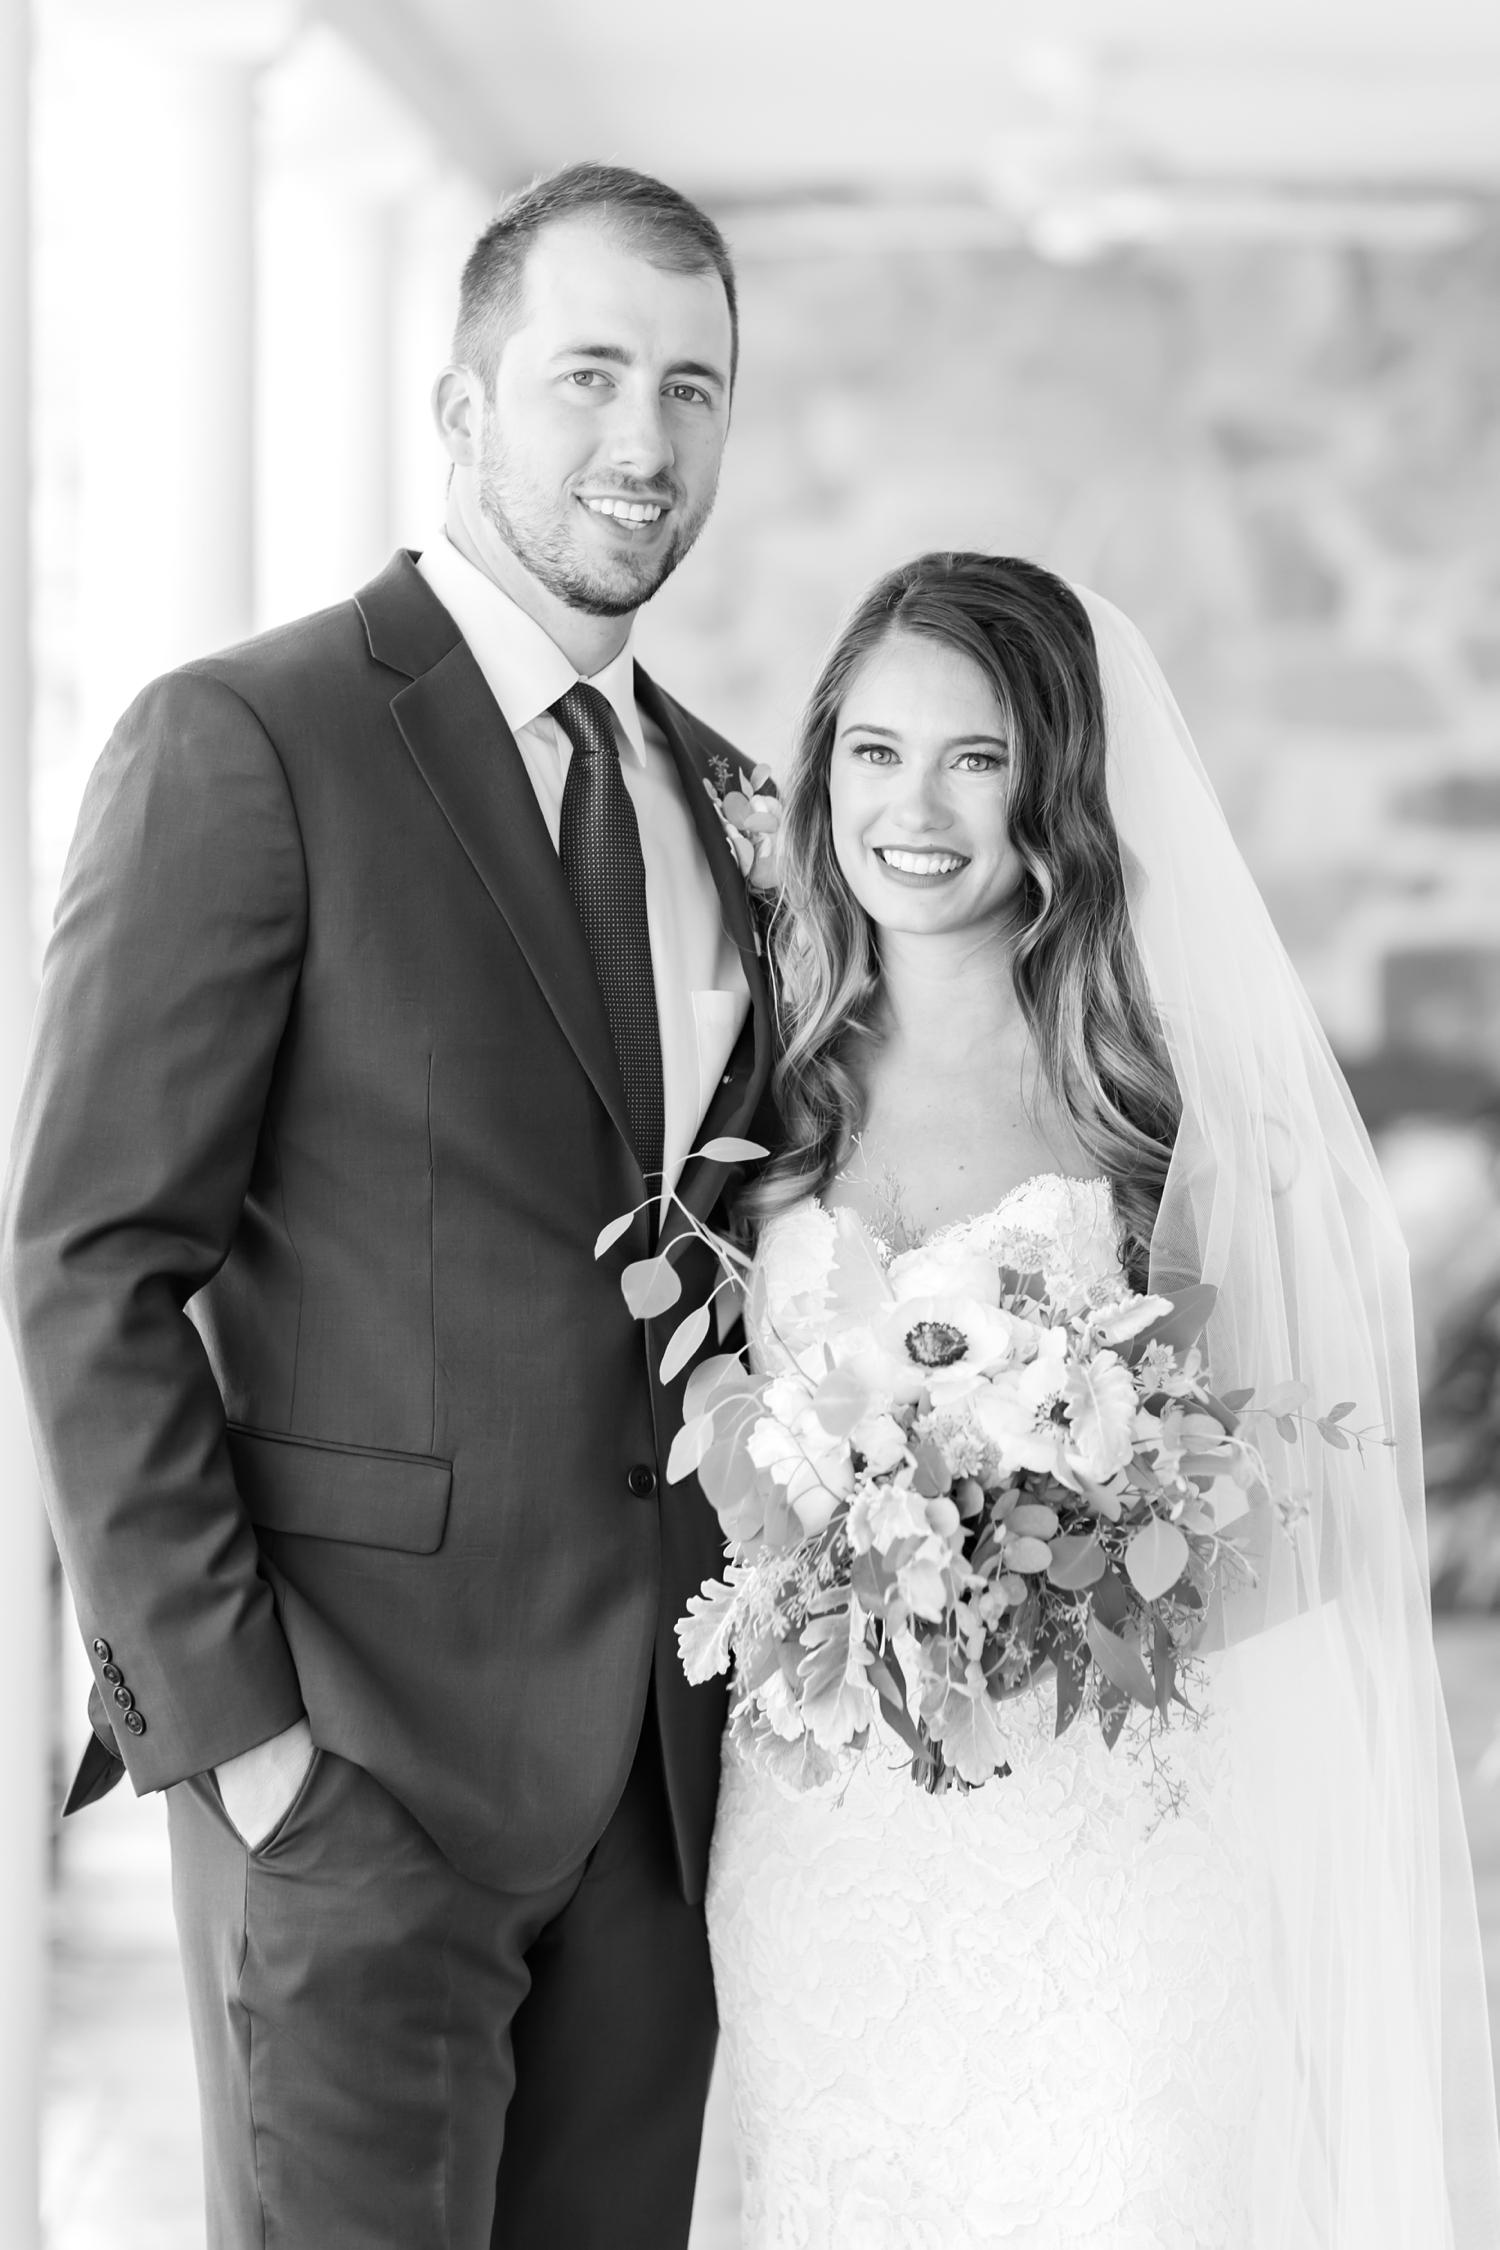 Webb WEDDING HIGHLIGHTS-122_Pond-View-Farm-wedding-Maryland-wedding-photographer-anna-grace-photography-photo.jpg